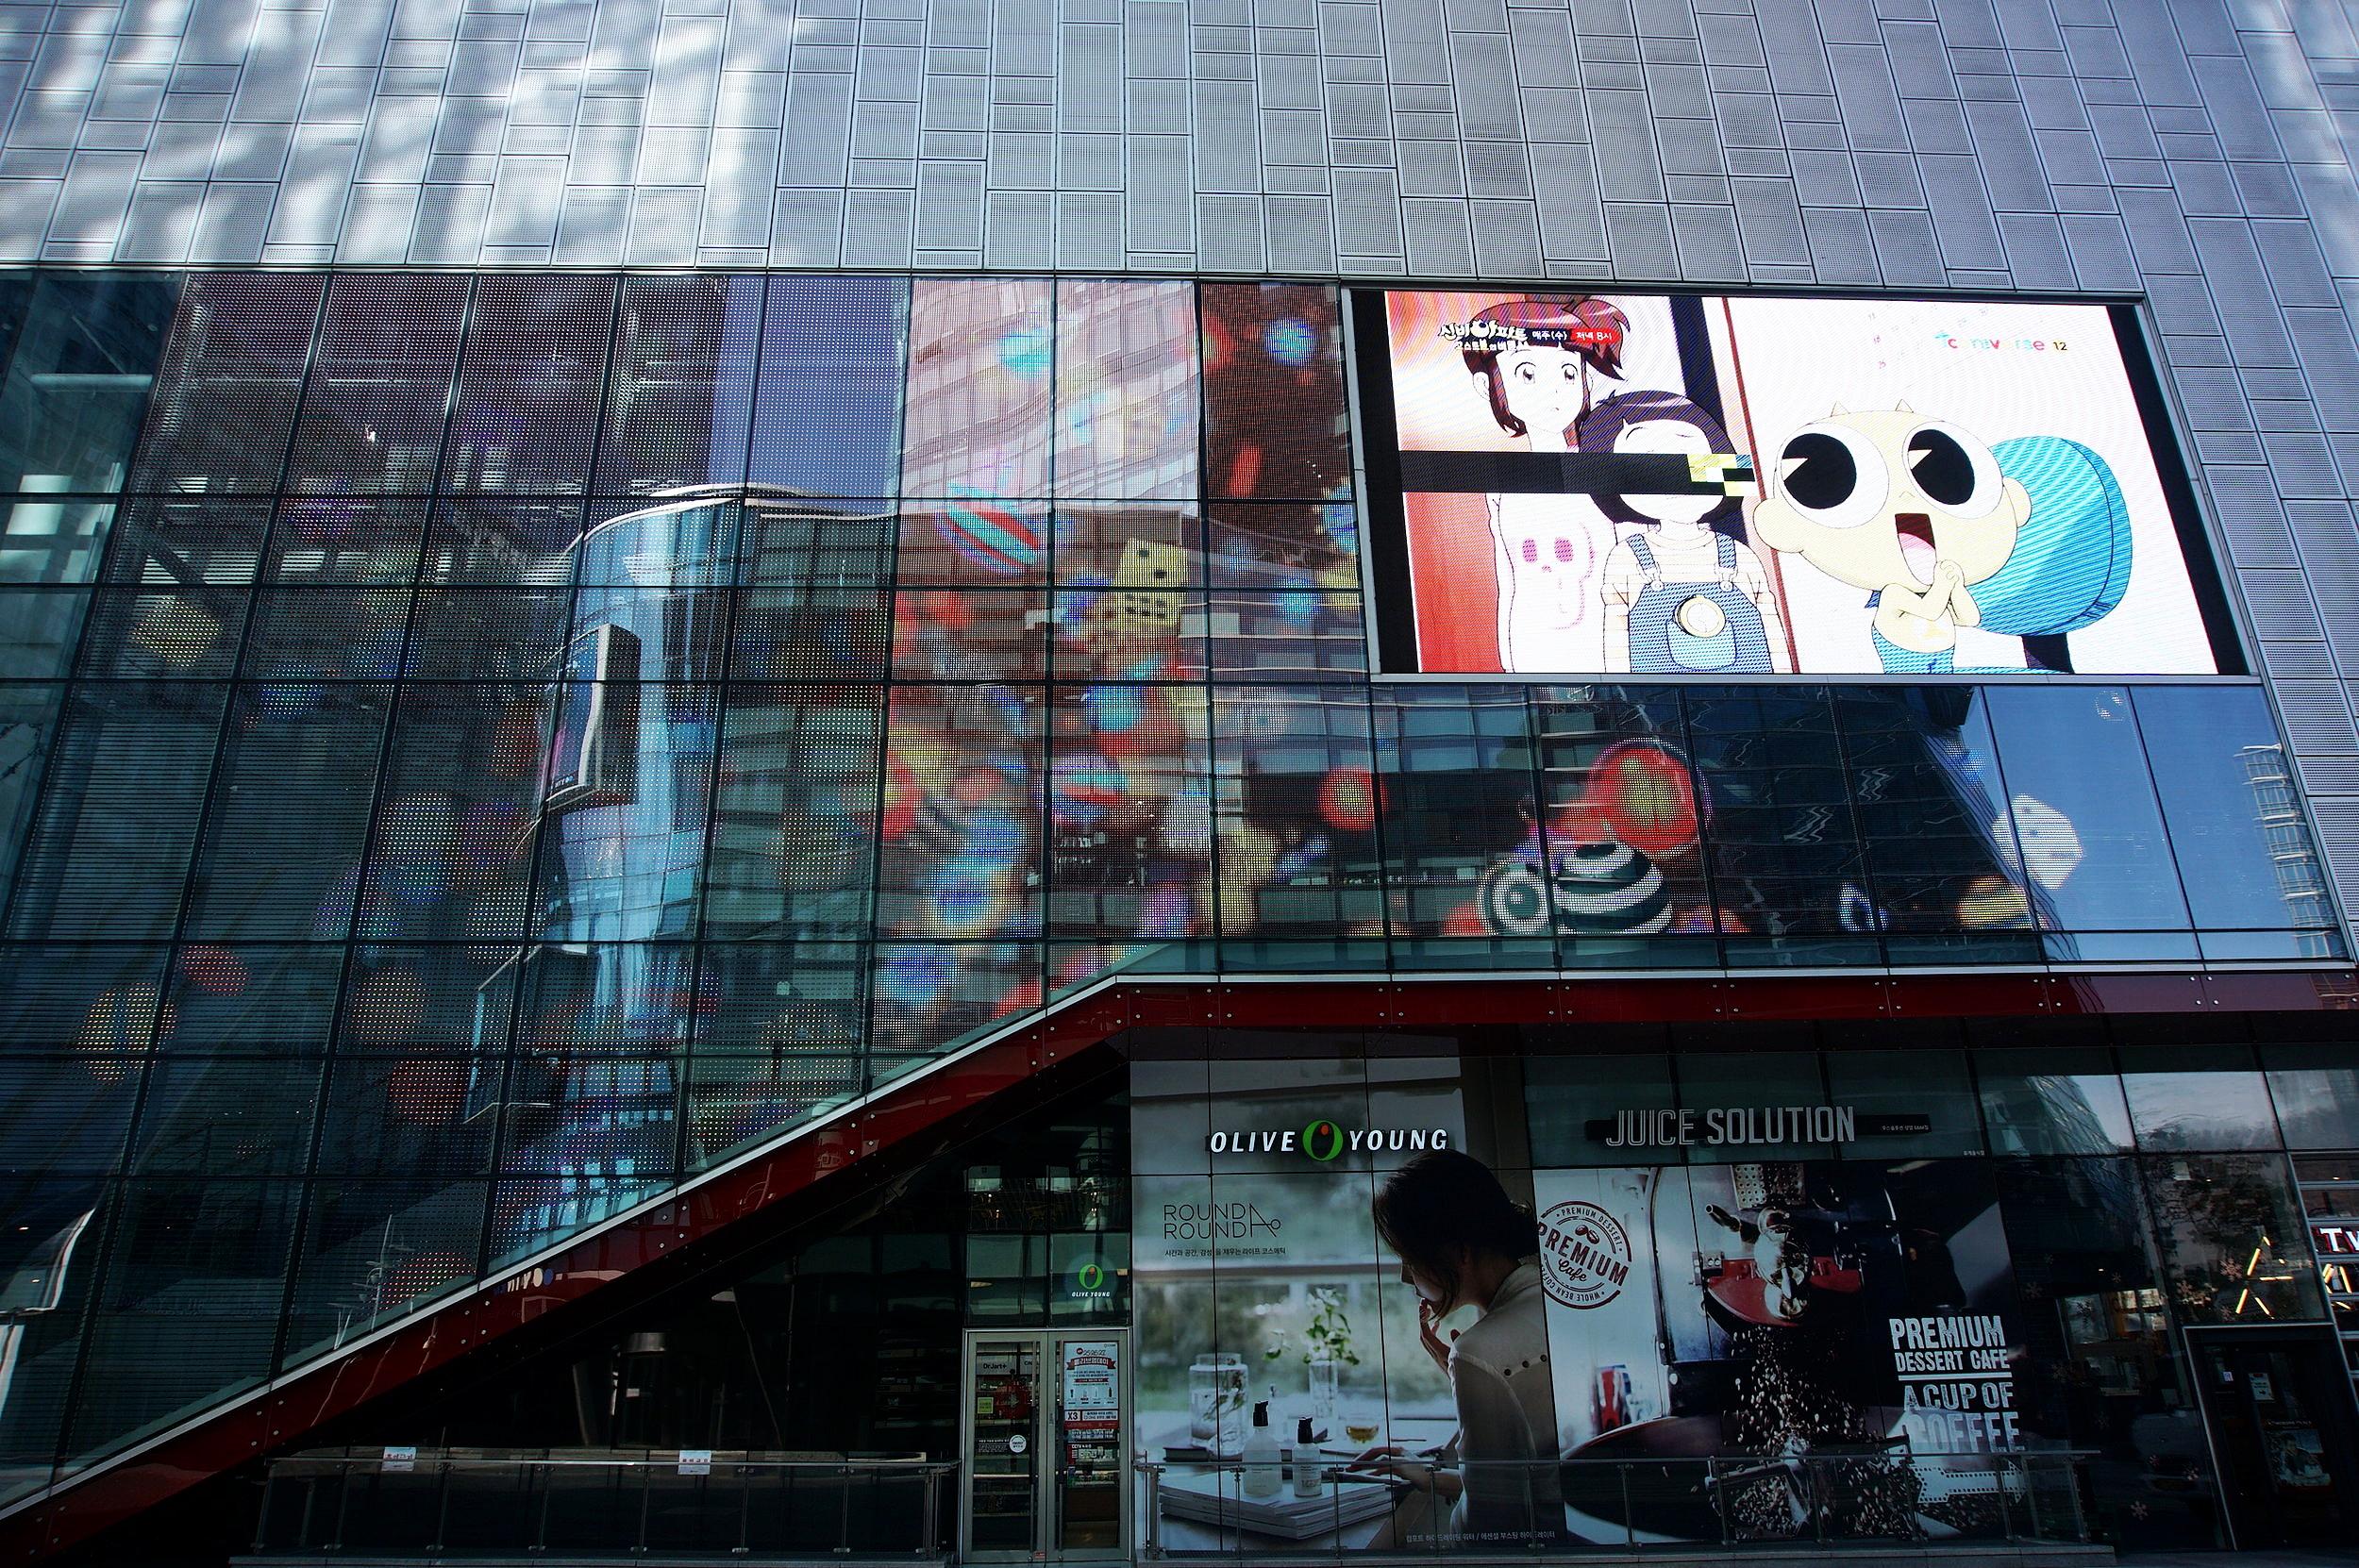 CJ E & M Digital Media City